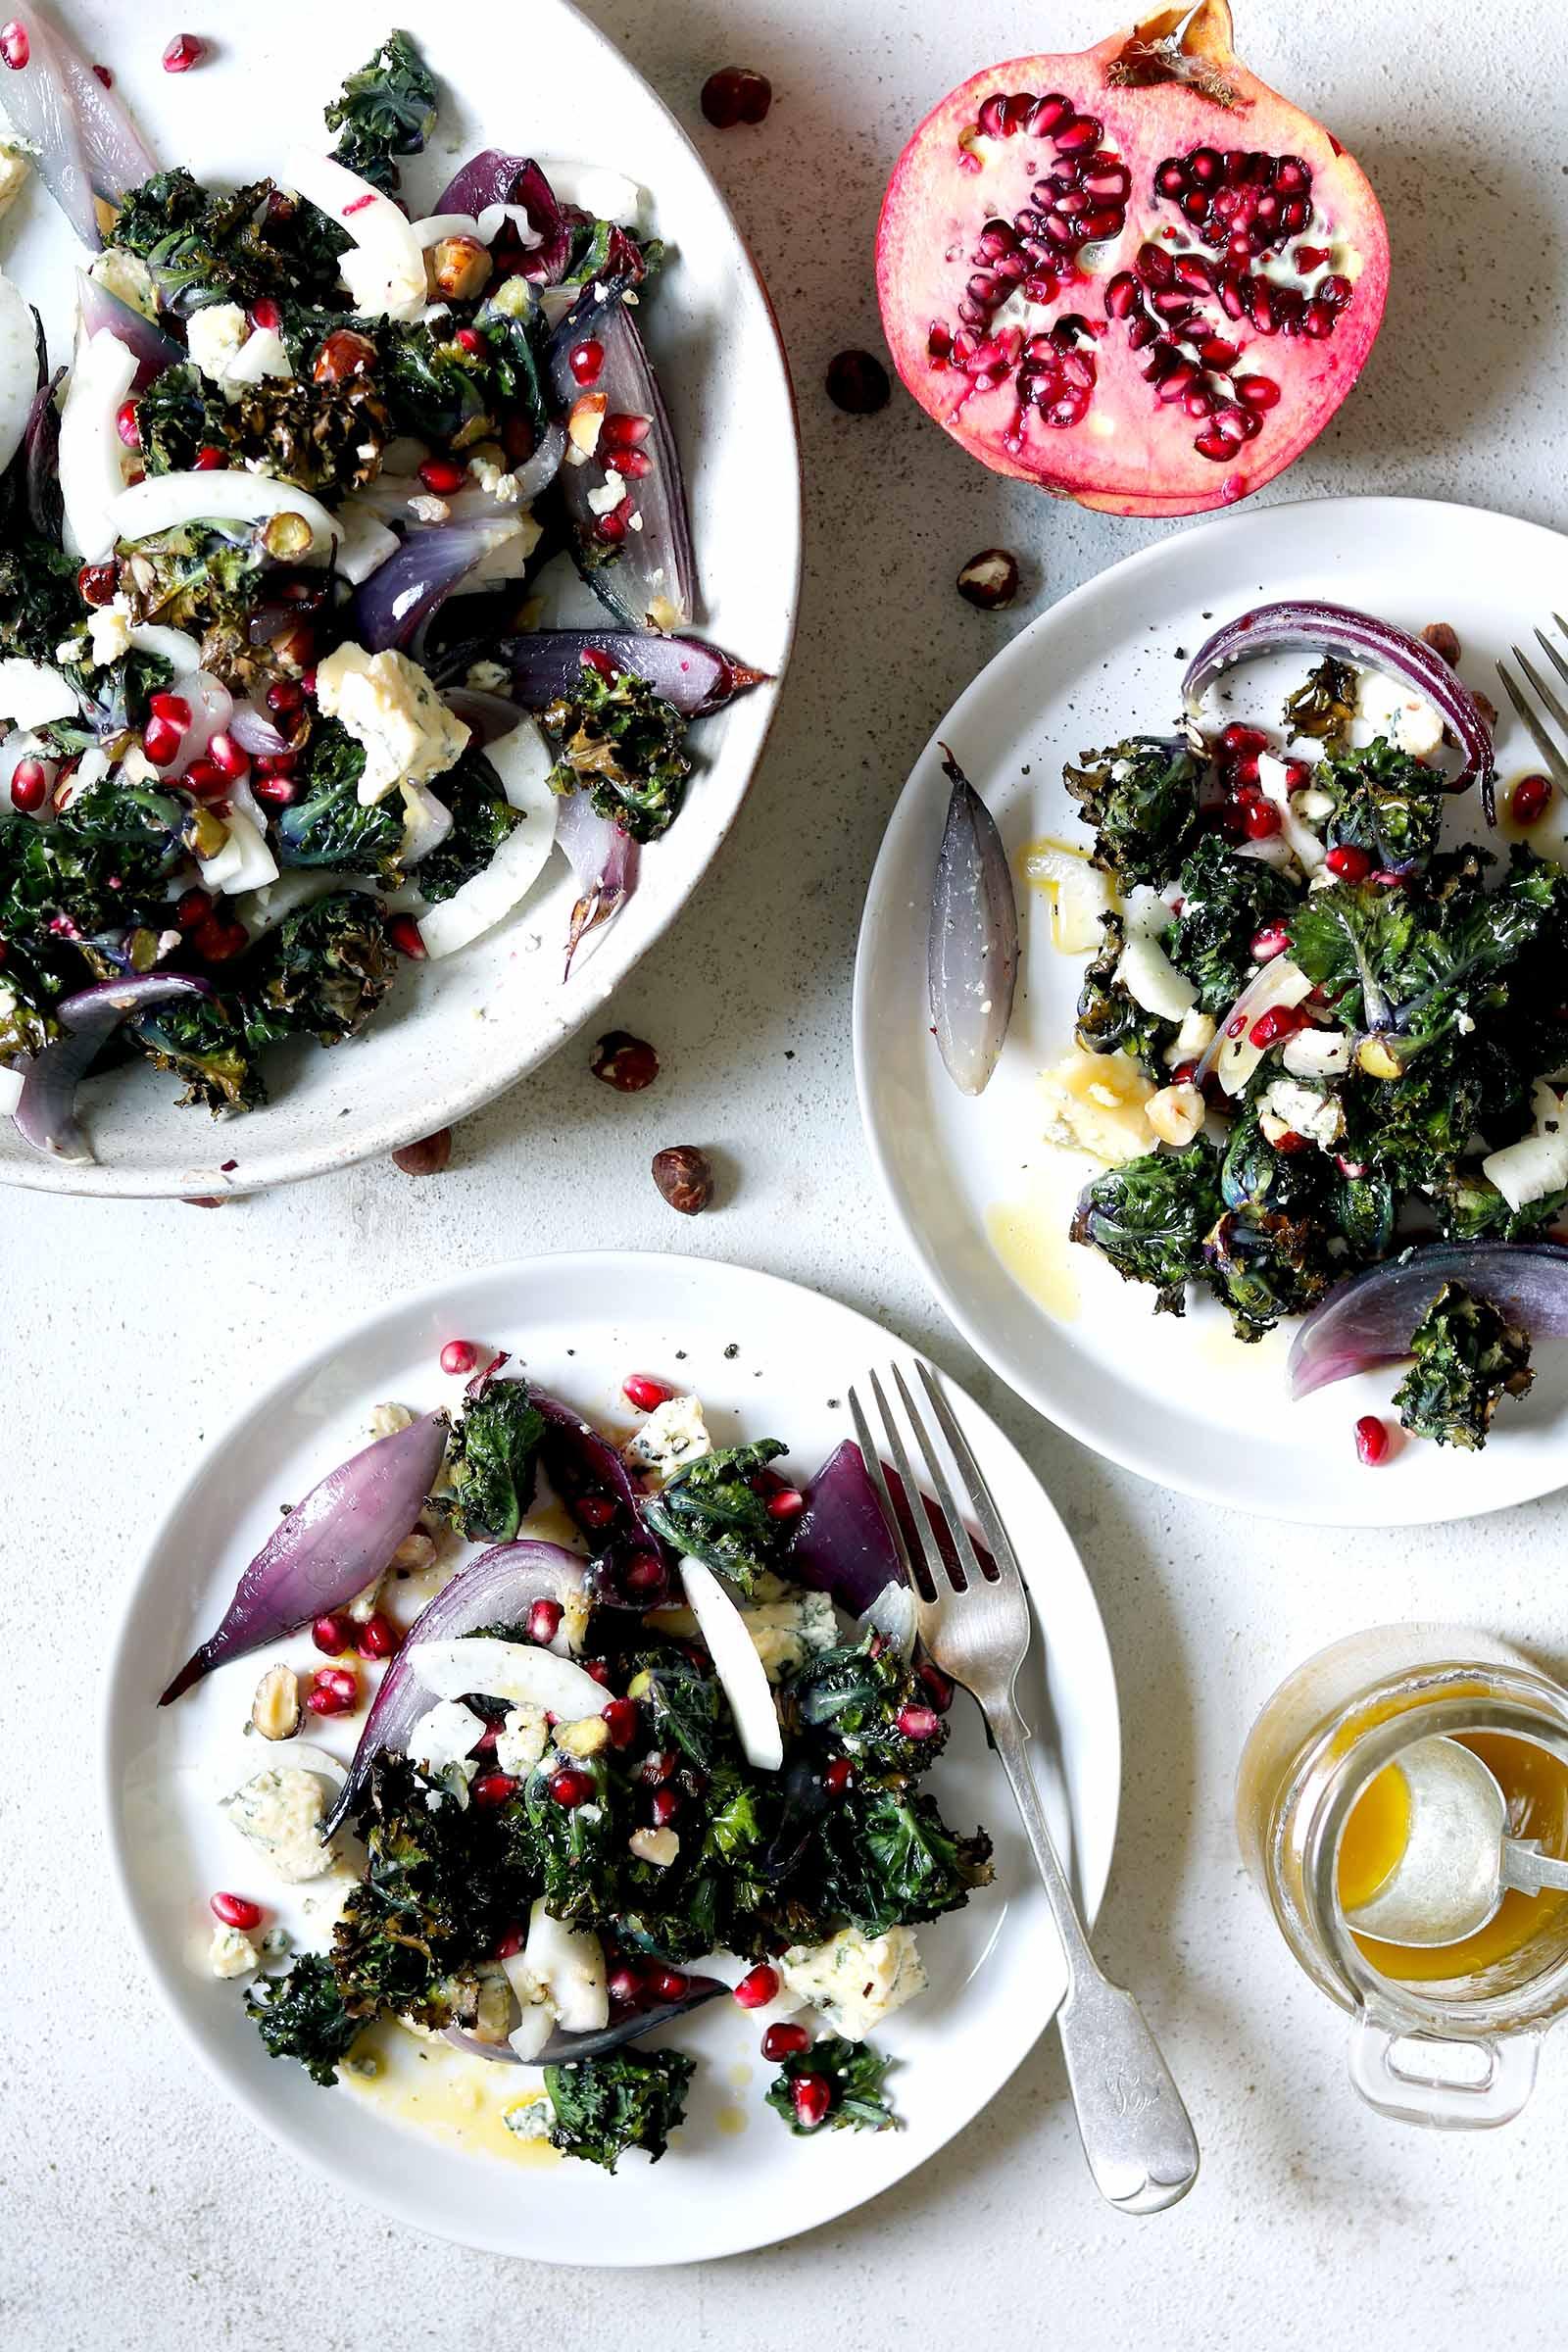 Winter Salad of Roasted Kalettes and Stilton